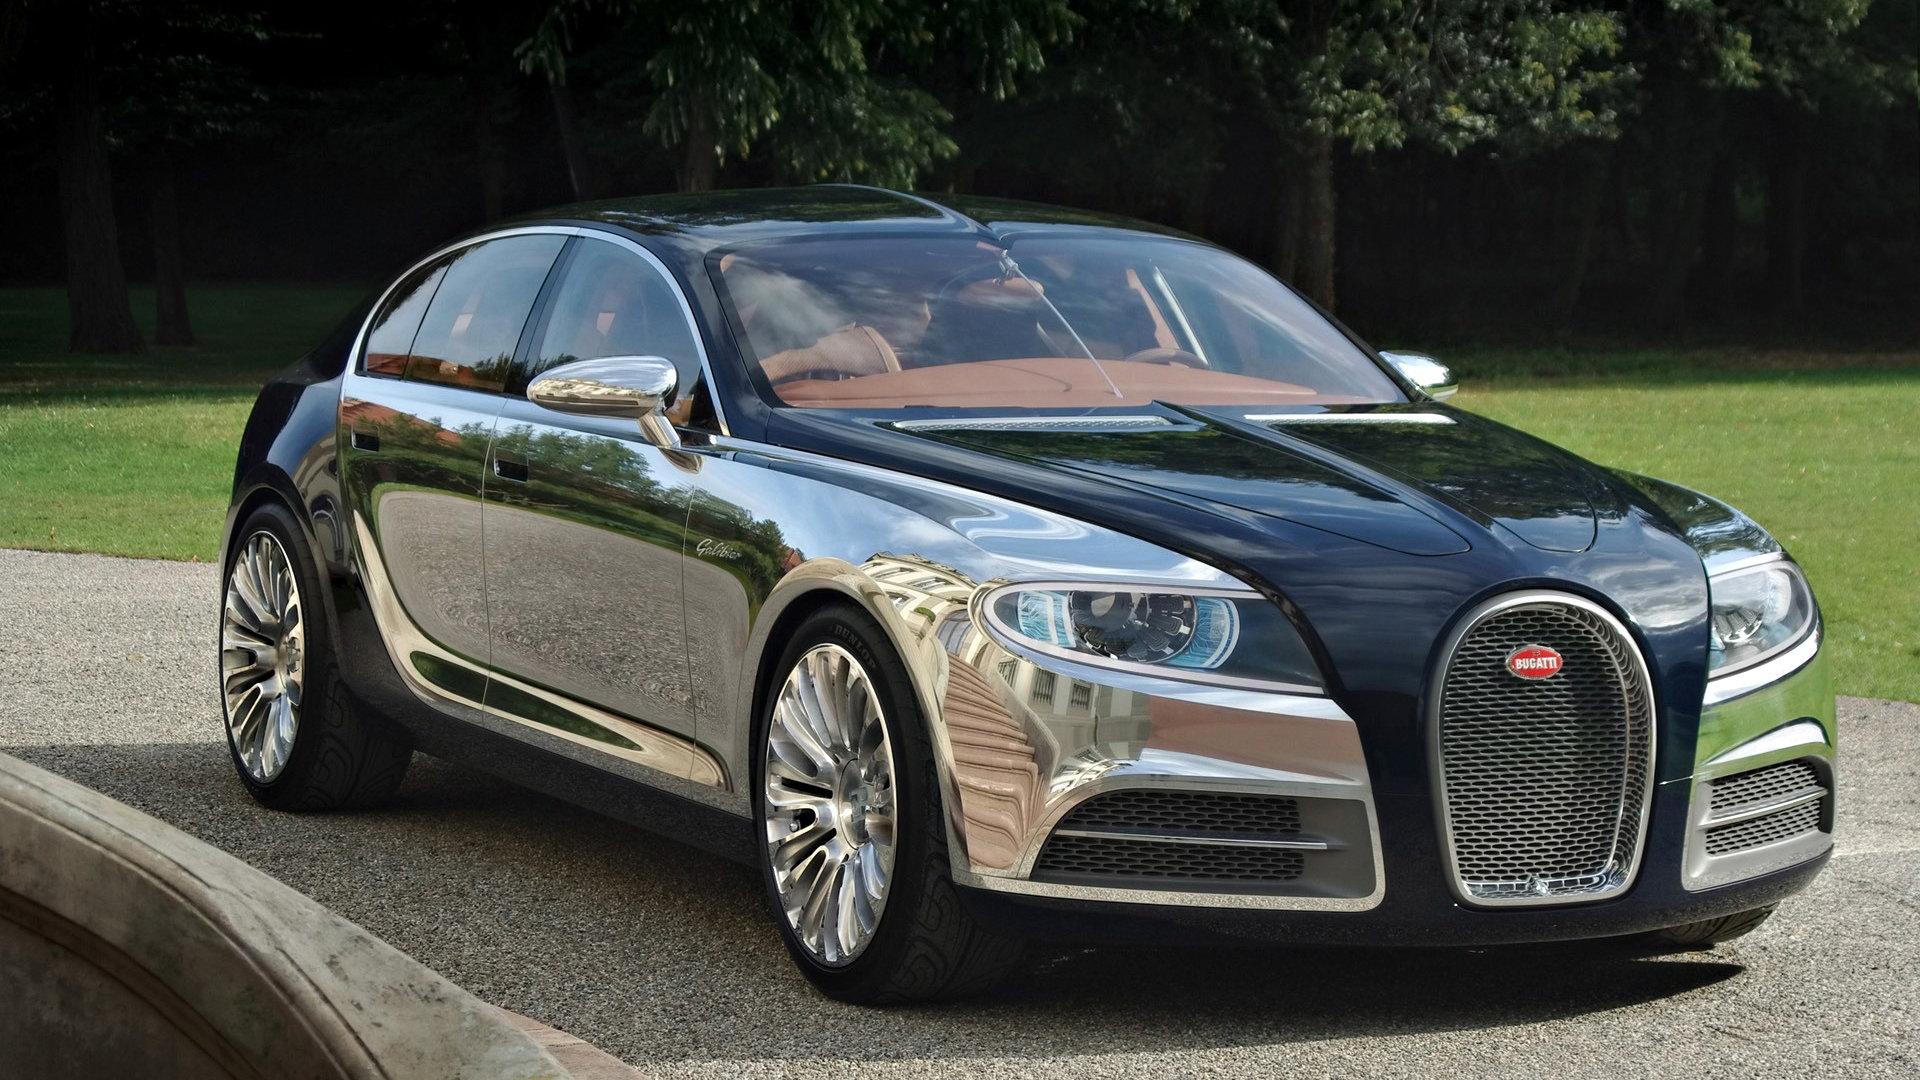 cars wallpaper,land vehicle,vehicle,car,automotive design,luxury vehicle